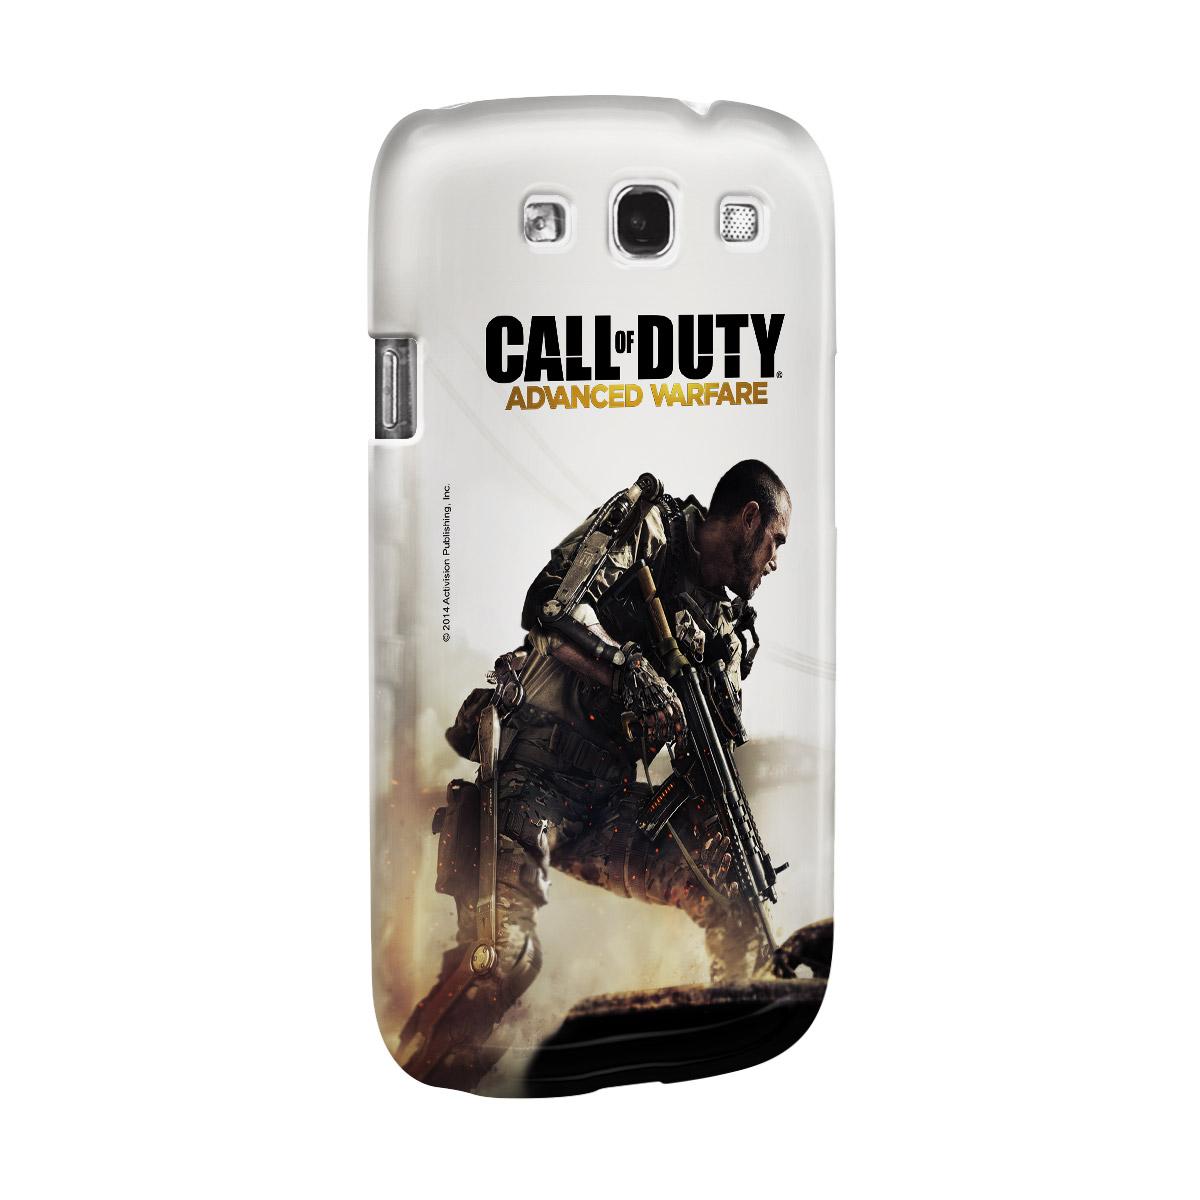 Capa de Celular Samsung Galaxy S3 Call of Duty Soldier